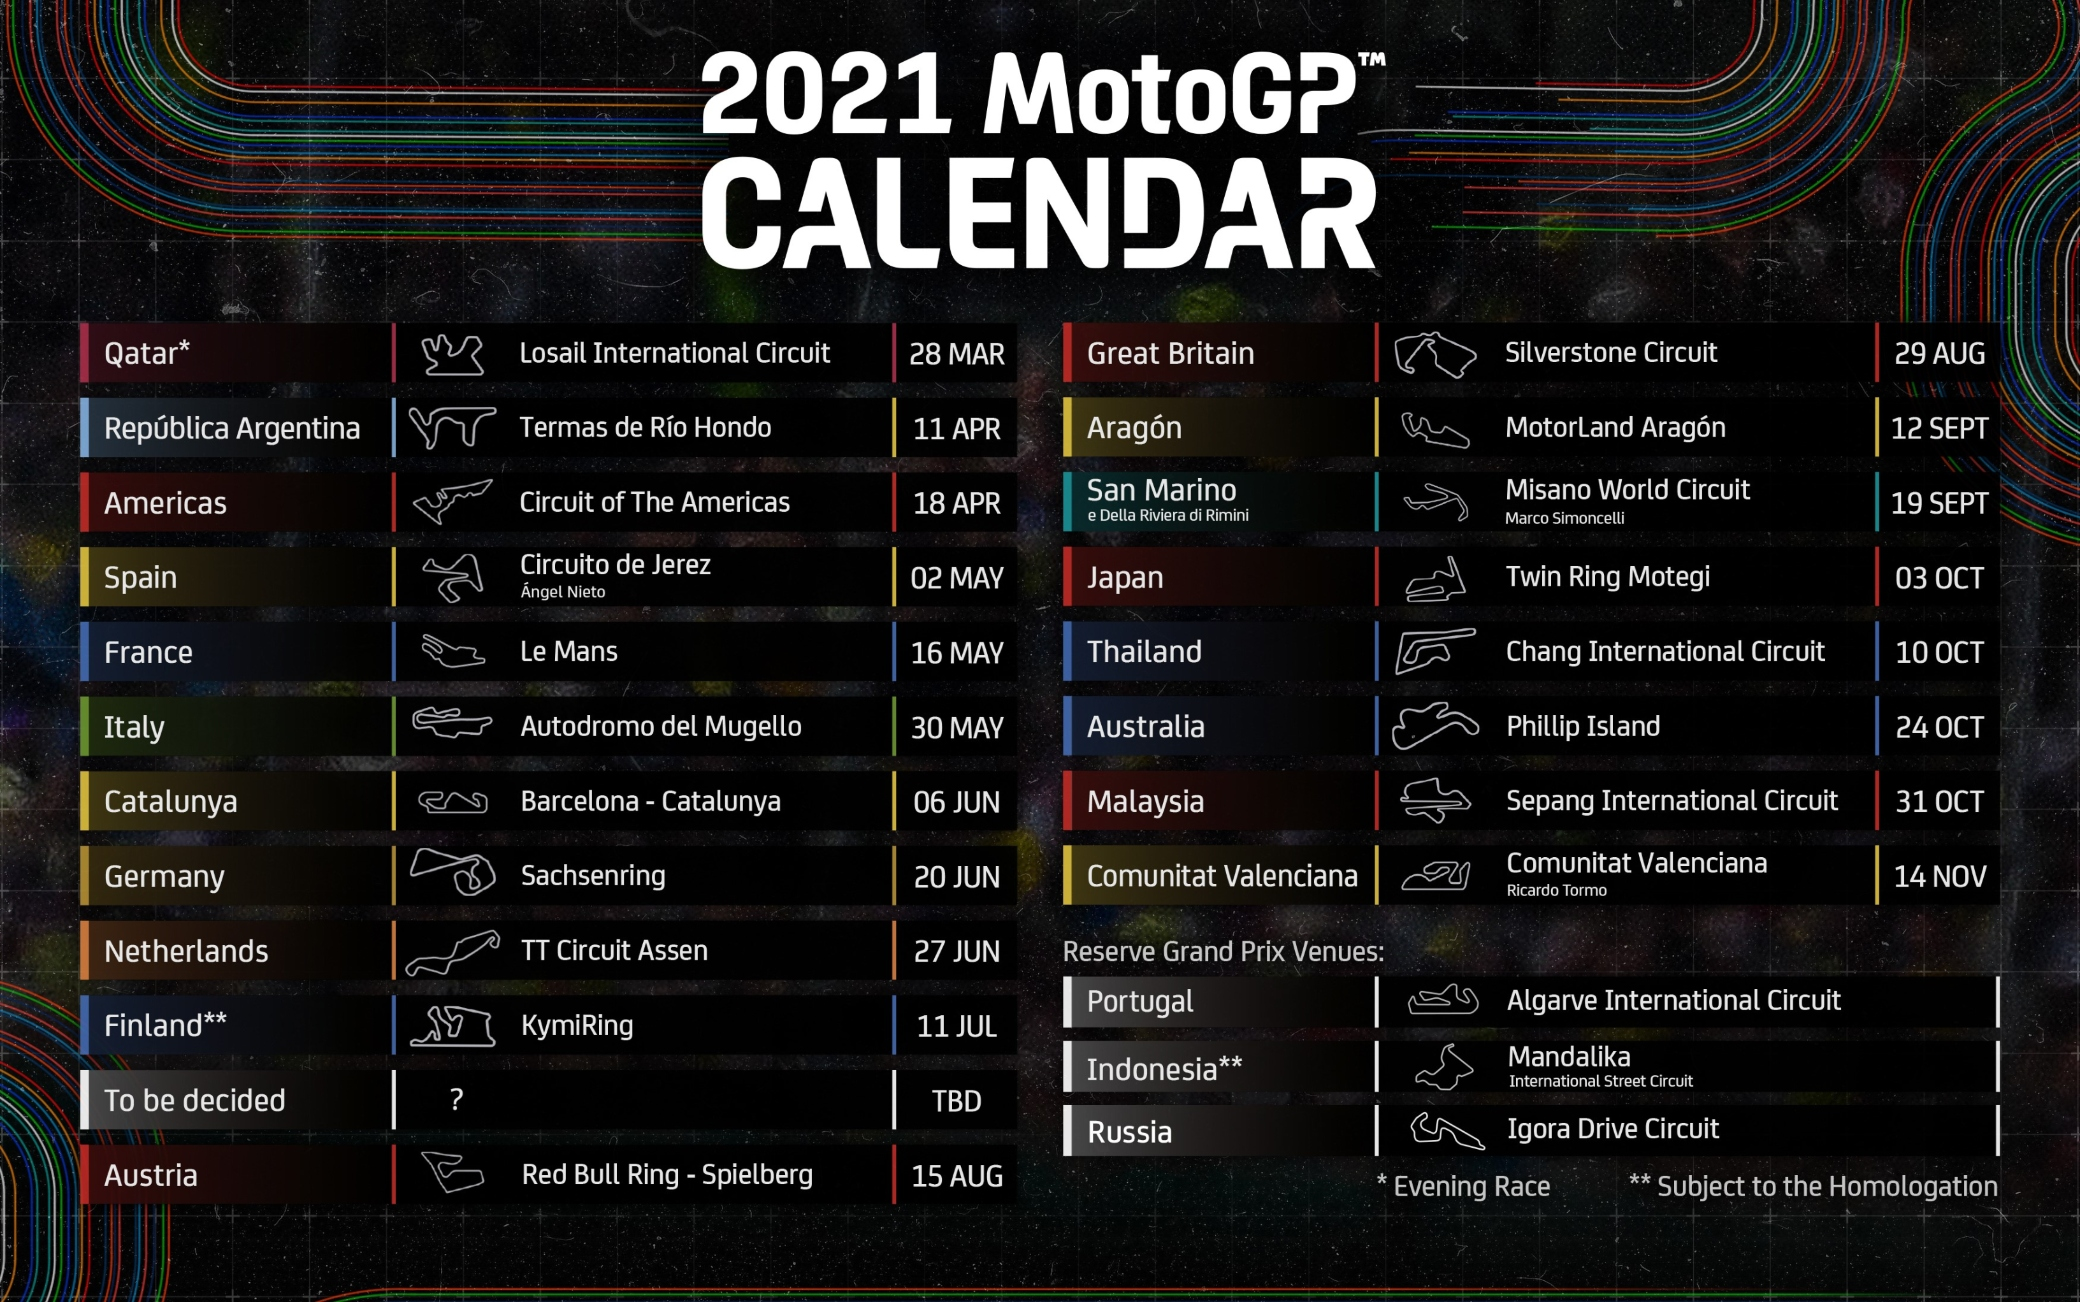 Moto 2 Calendario 2021 Calendario MotoGP 2021, la bozza con 20 GP e 3 'riserve' | Sky Sport